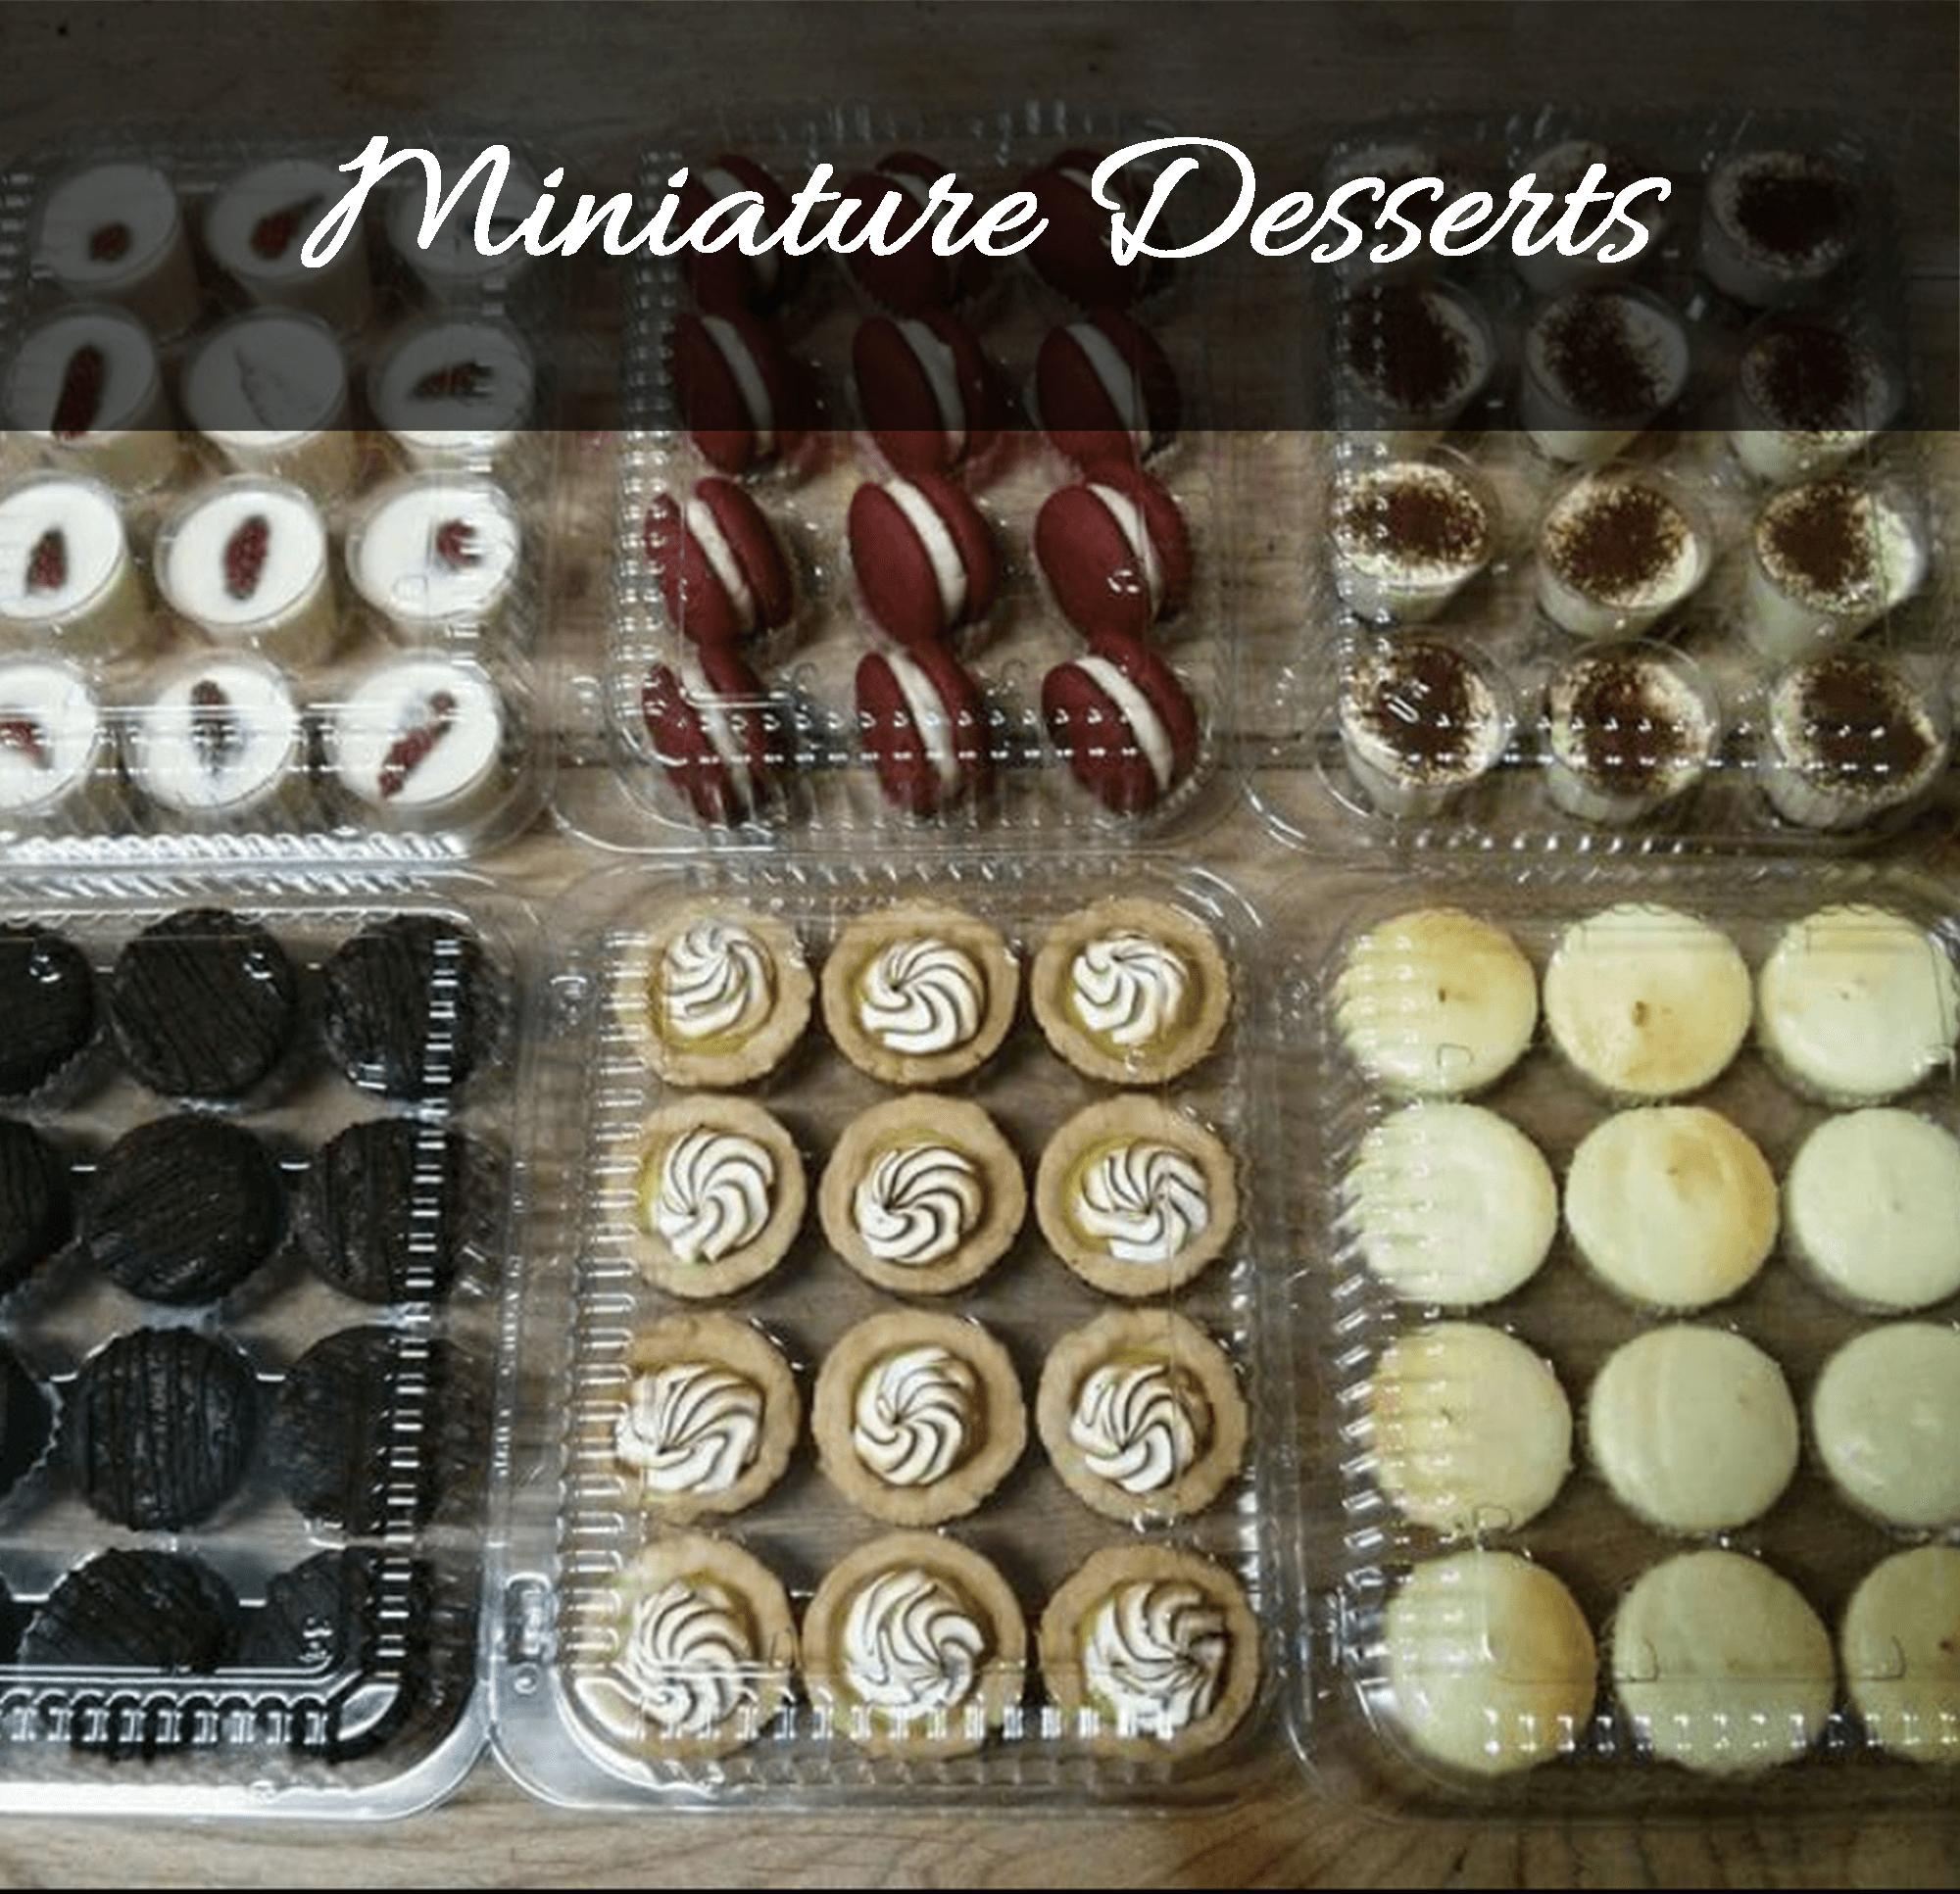 Catering_Menus - Minature-Desserts-1.png